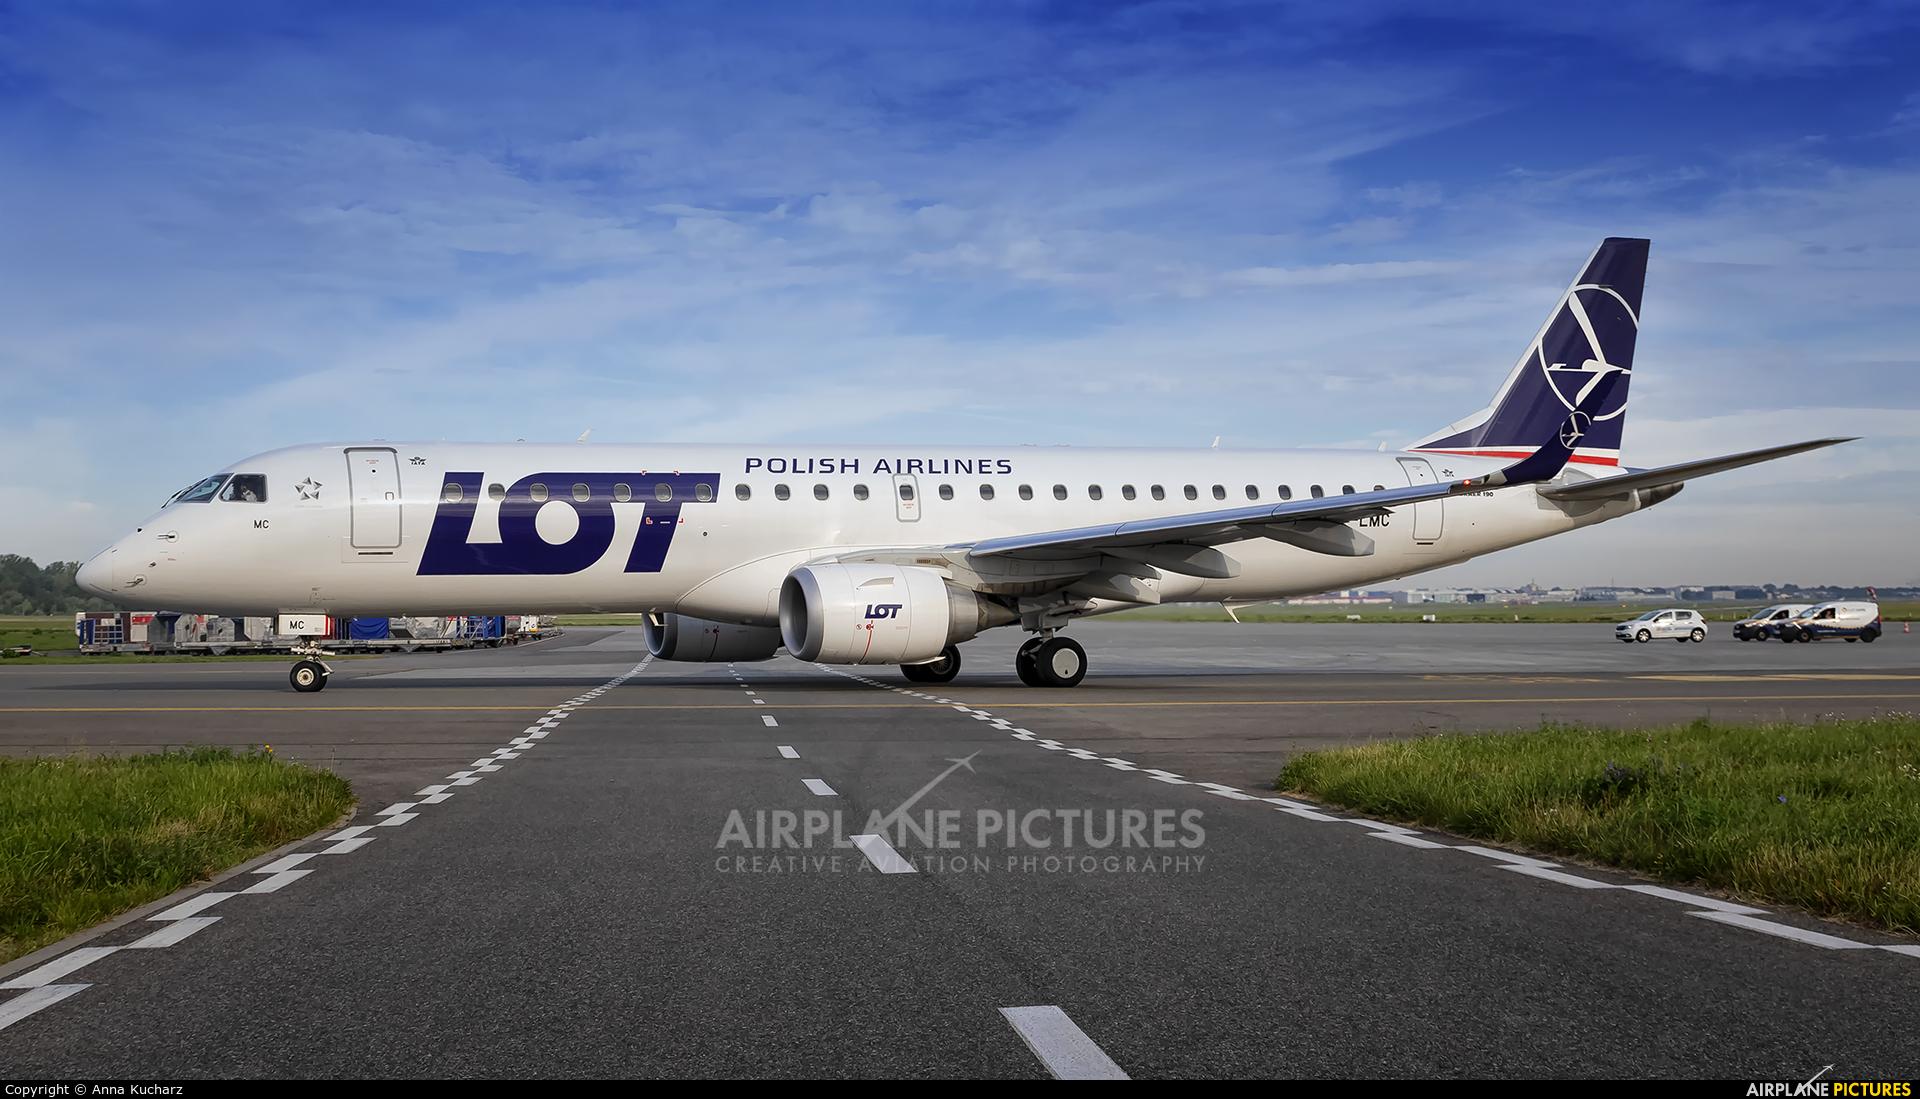 LOT - Polish Airlines SP-LNM aircraft at Warsaw - Frederic Chopin